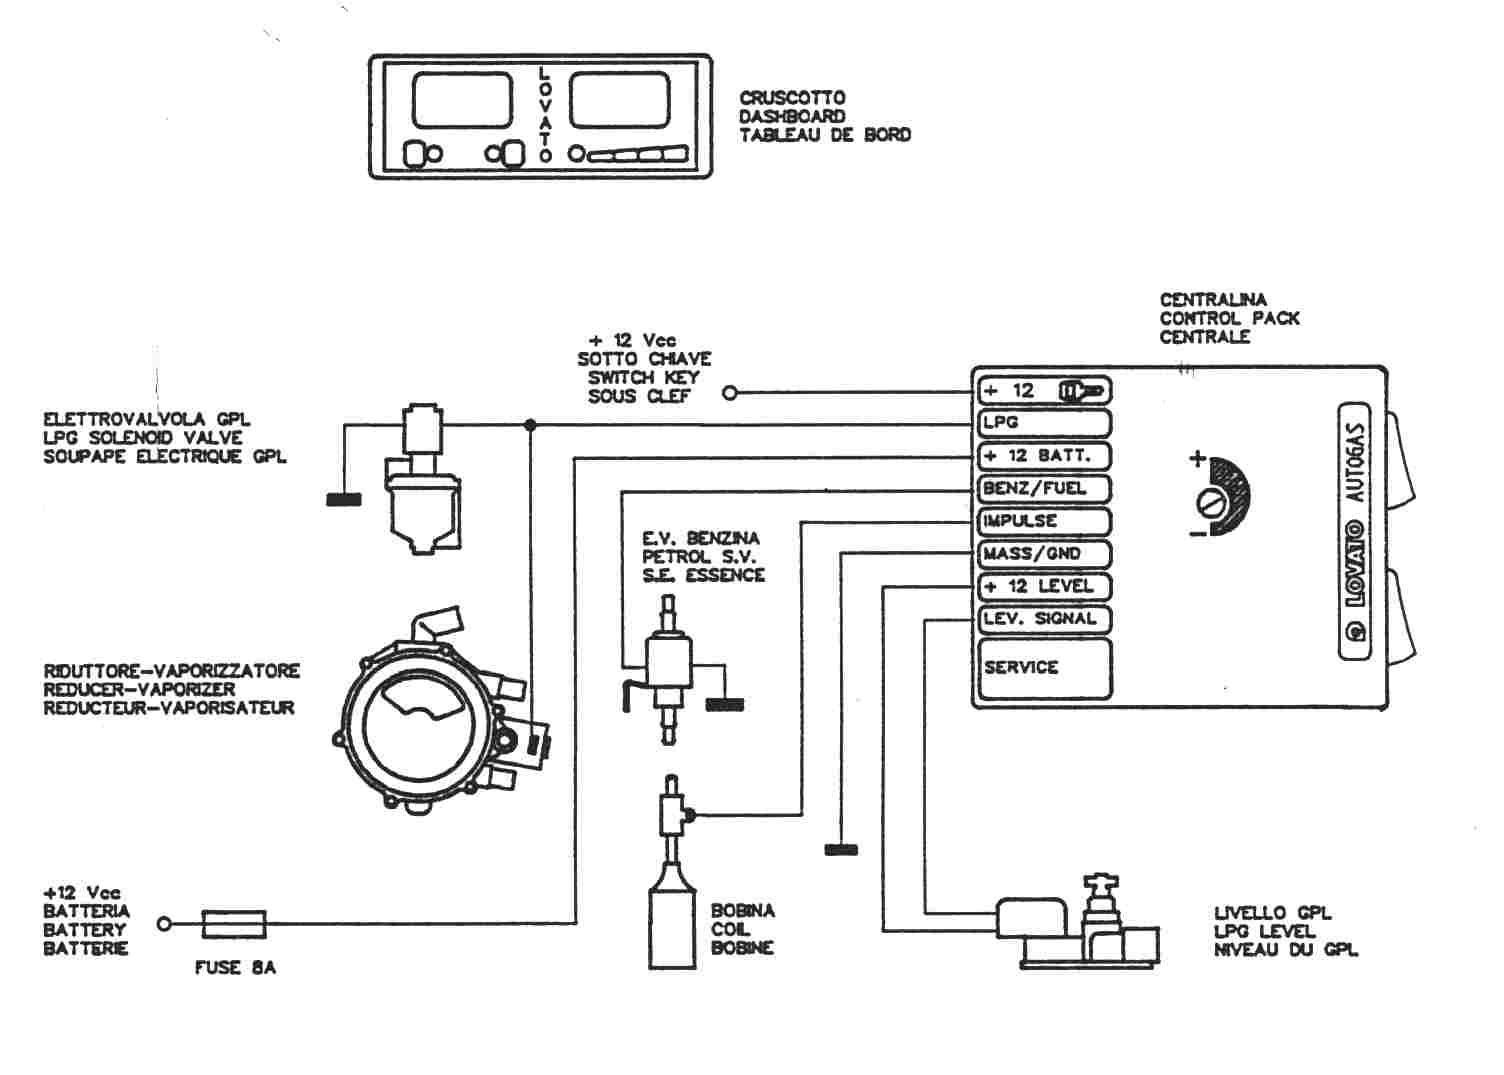 Tamona in-3 инжектор схема подключения